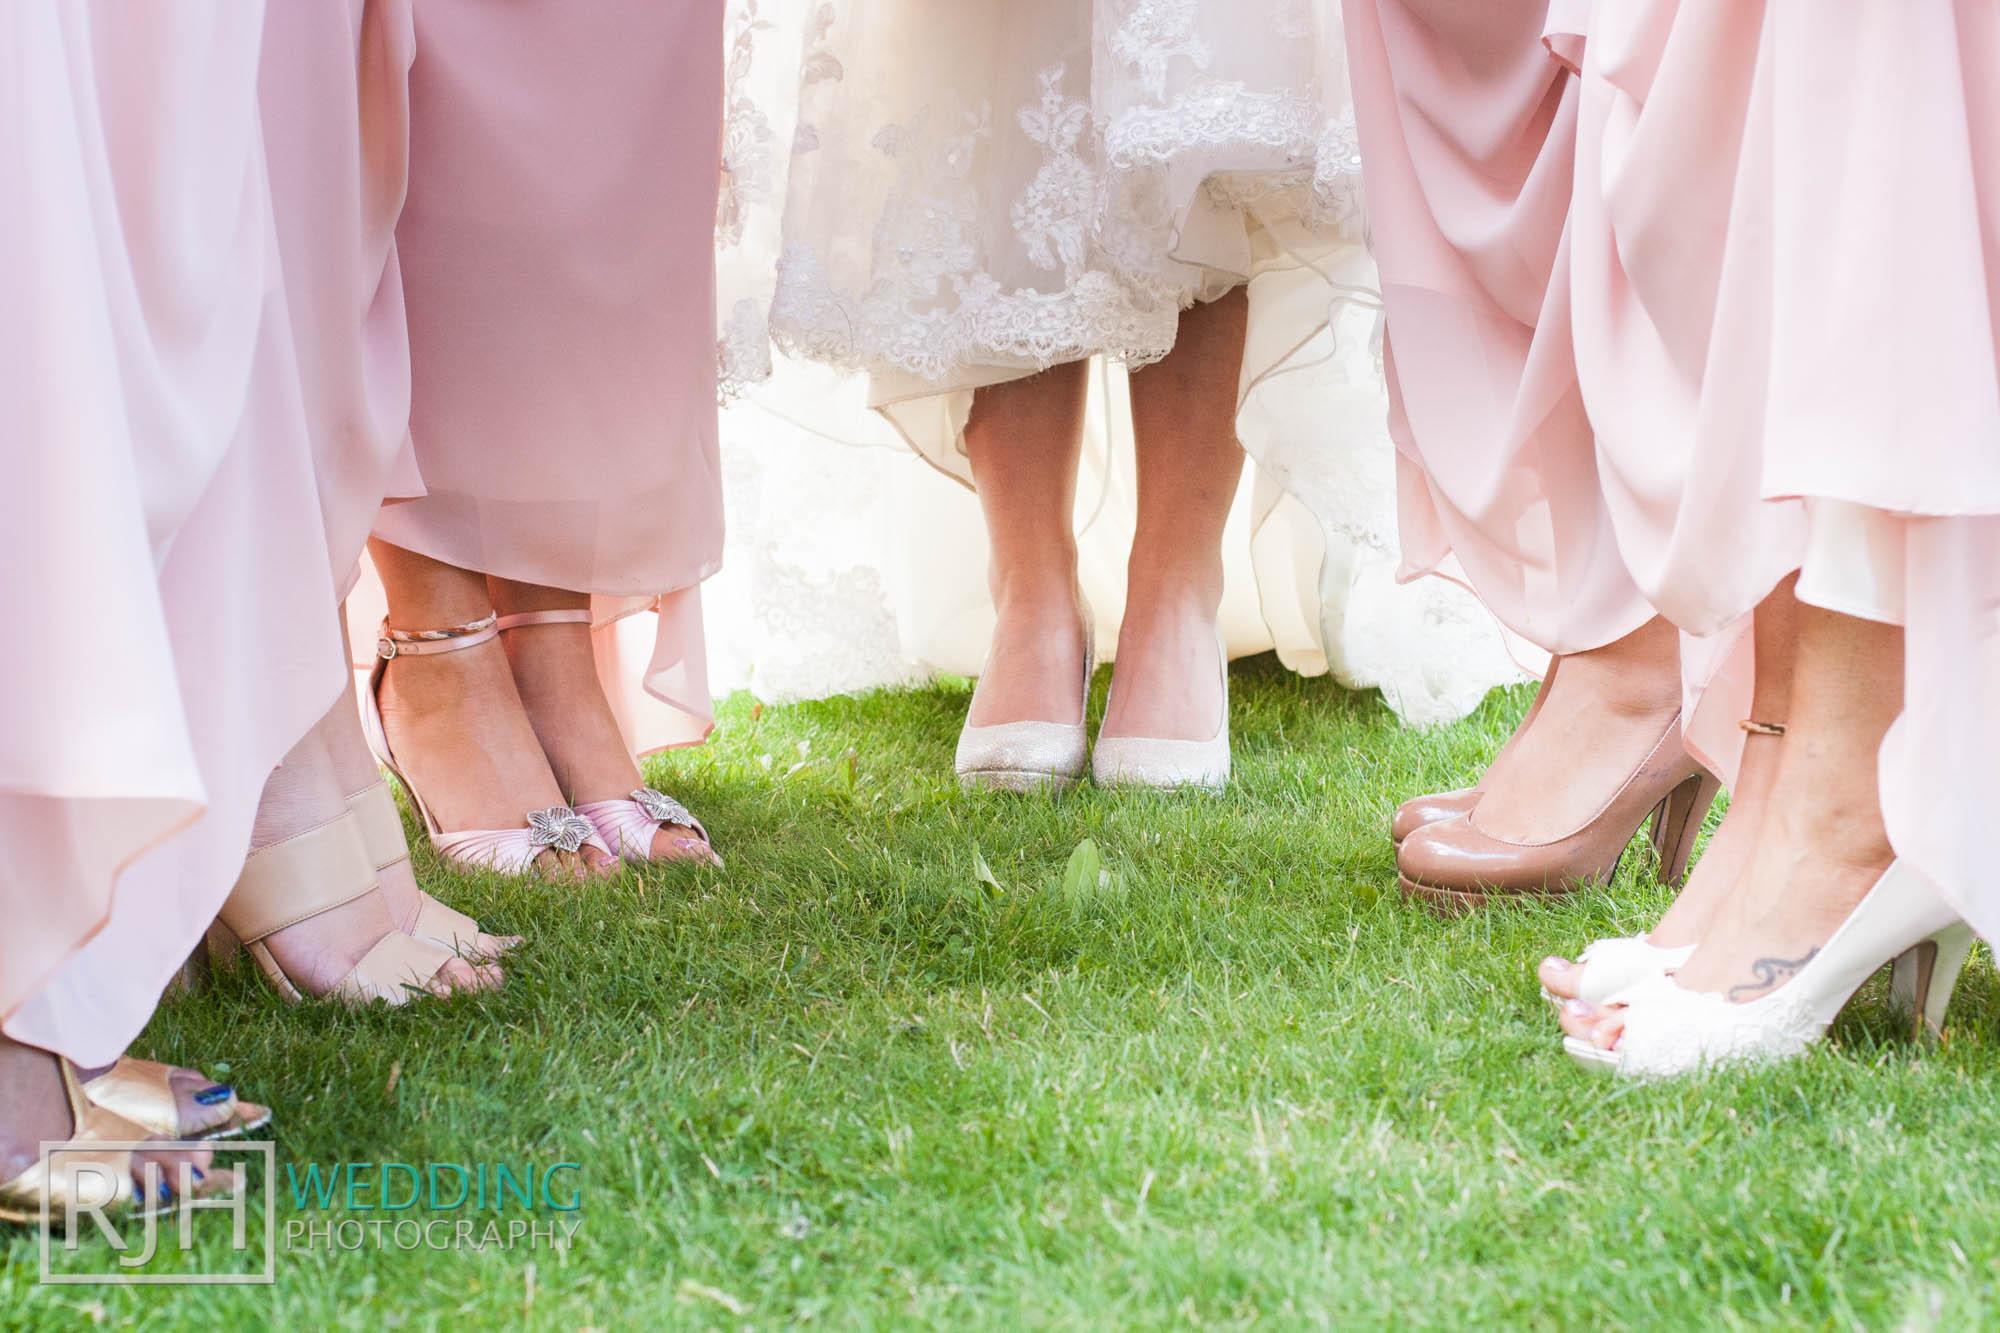 RJH Wedding Photography_Tankersley Manor Wedding_32.jpg